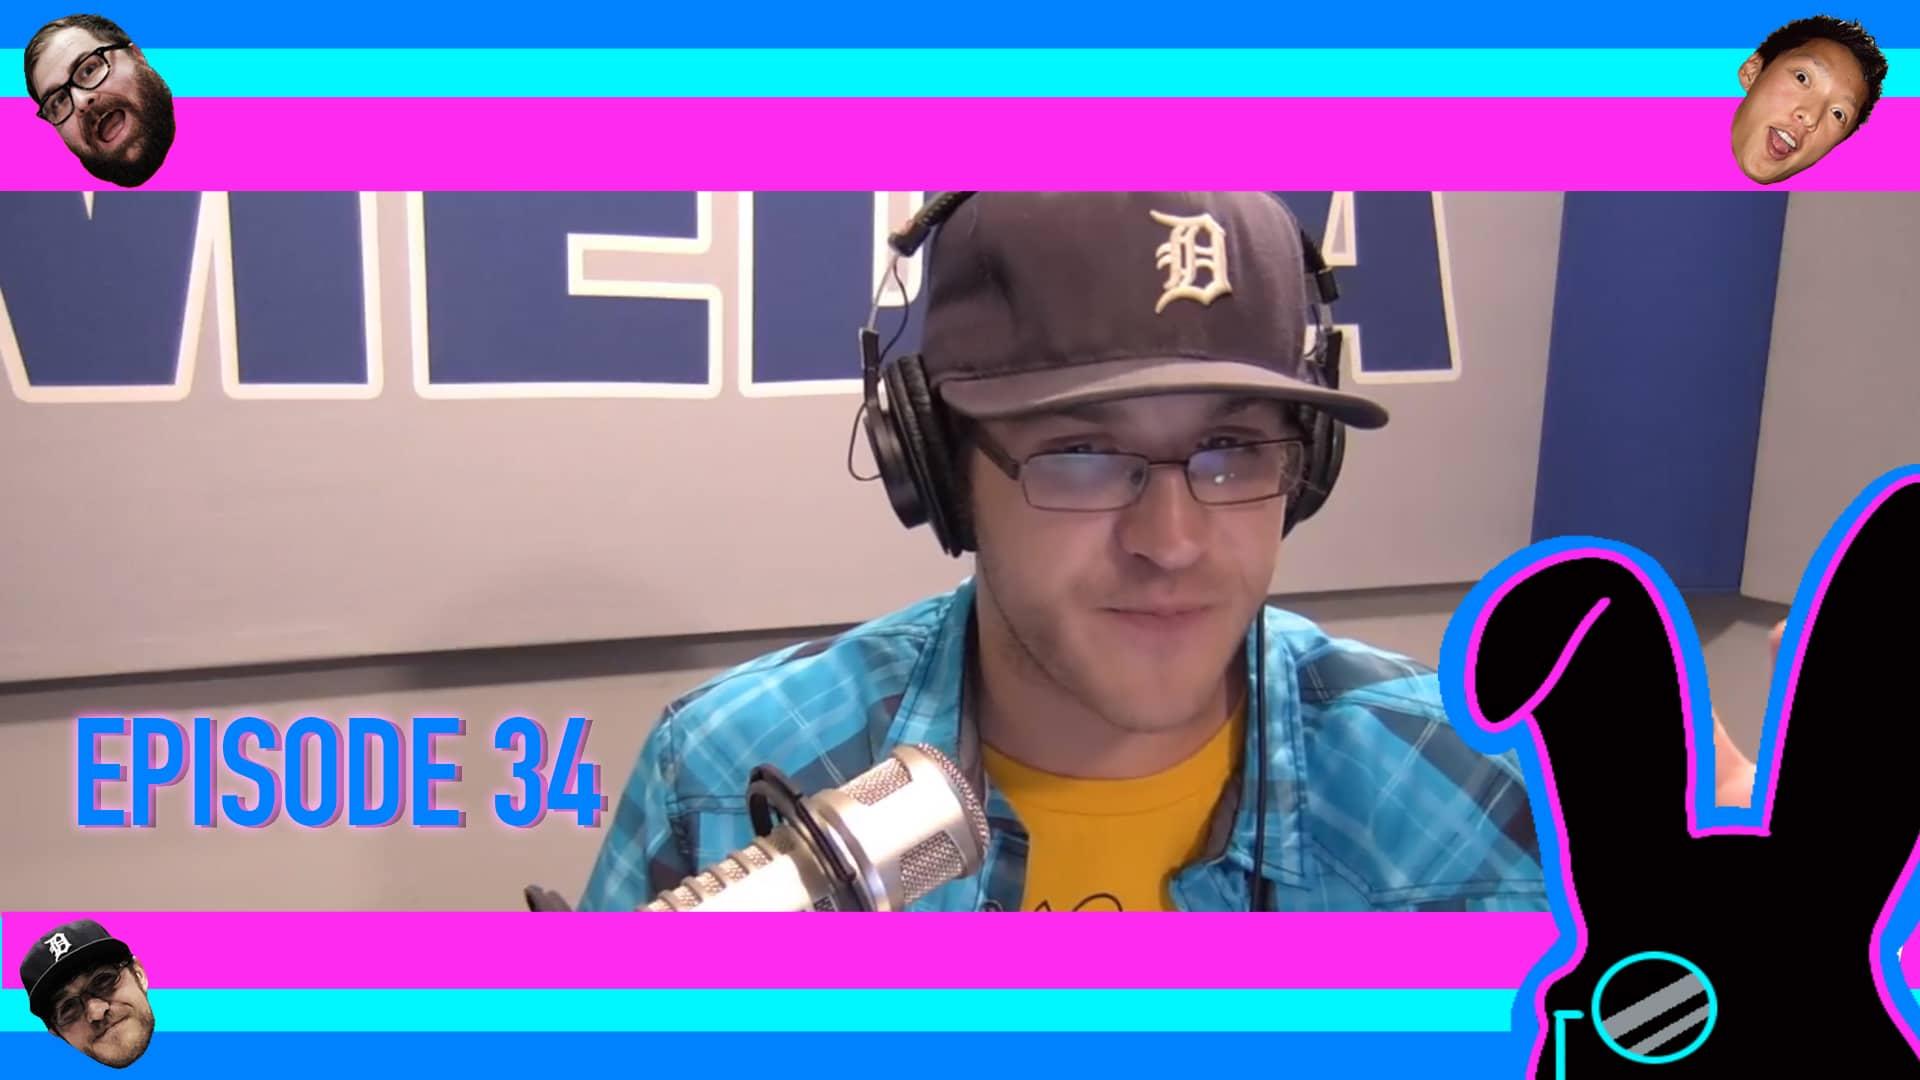 Geektainment Weekly - Episode 34